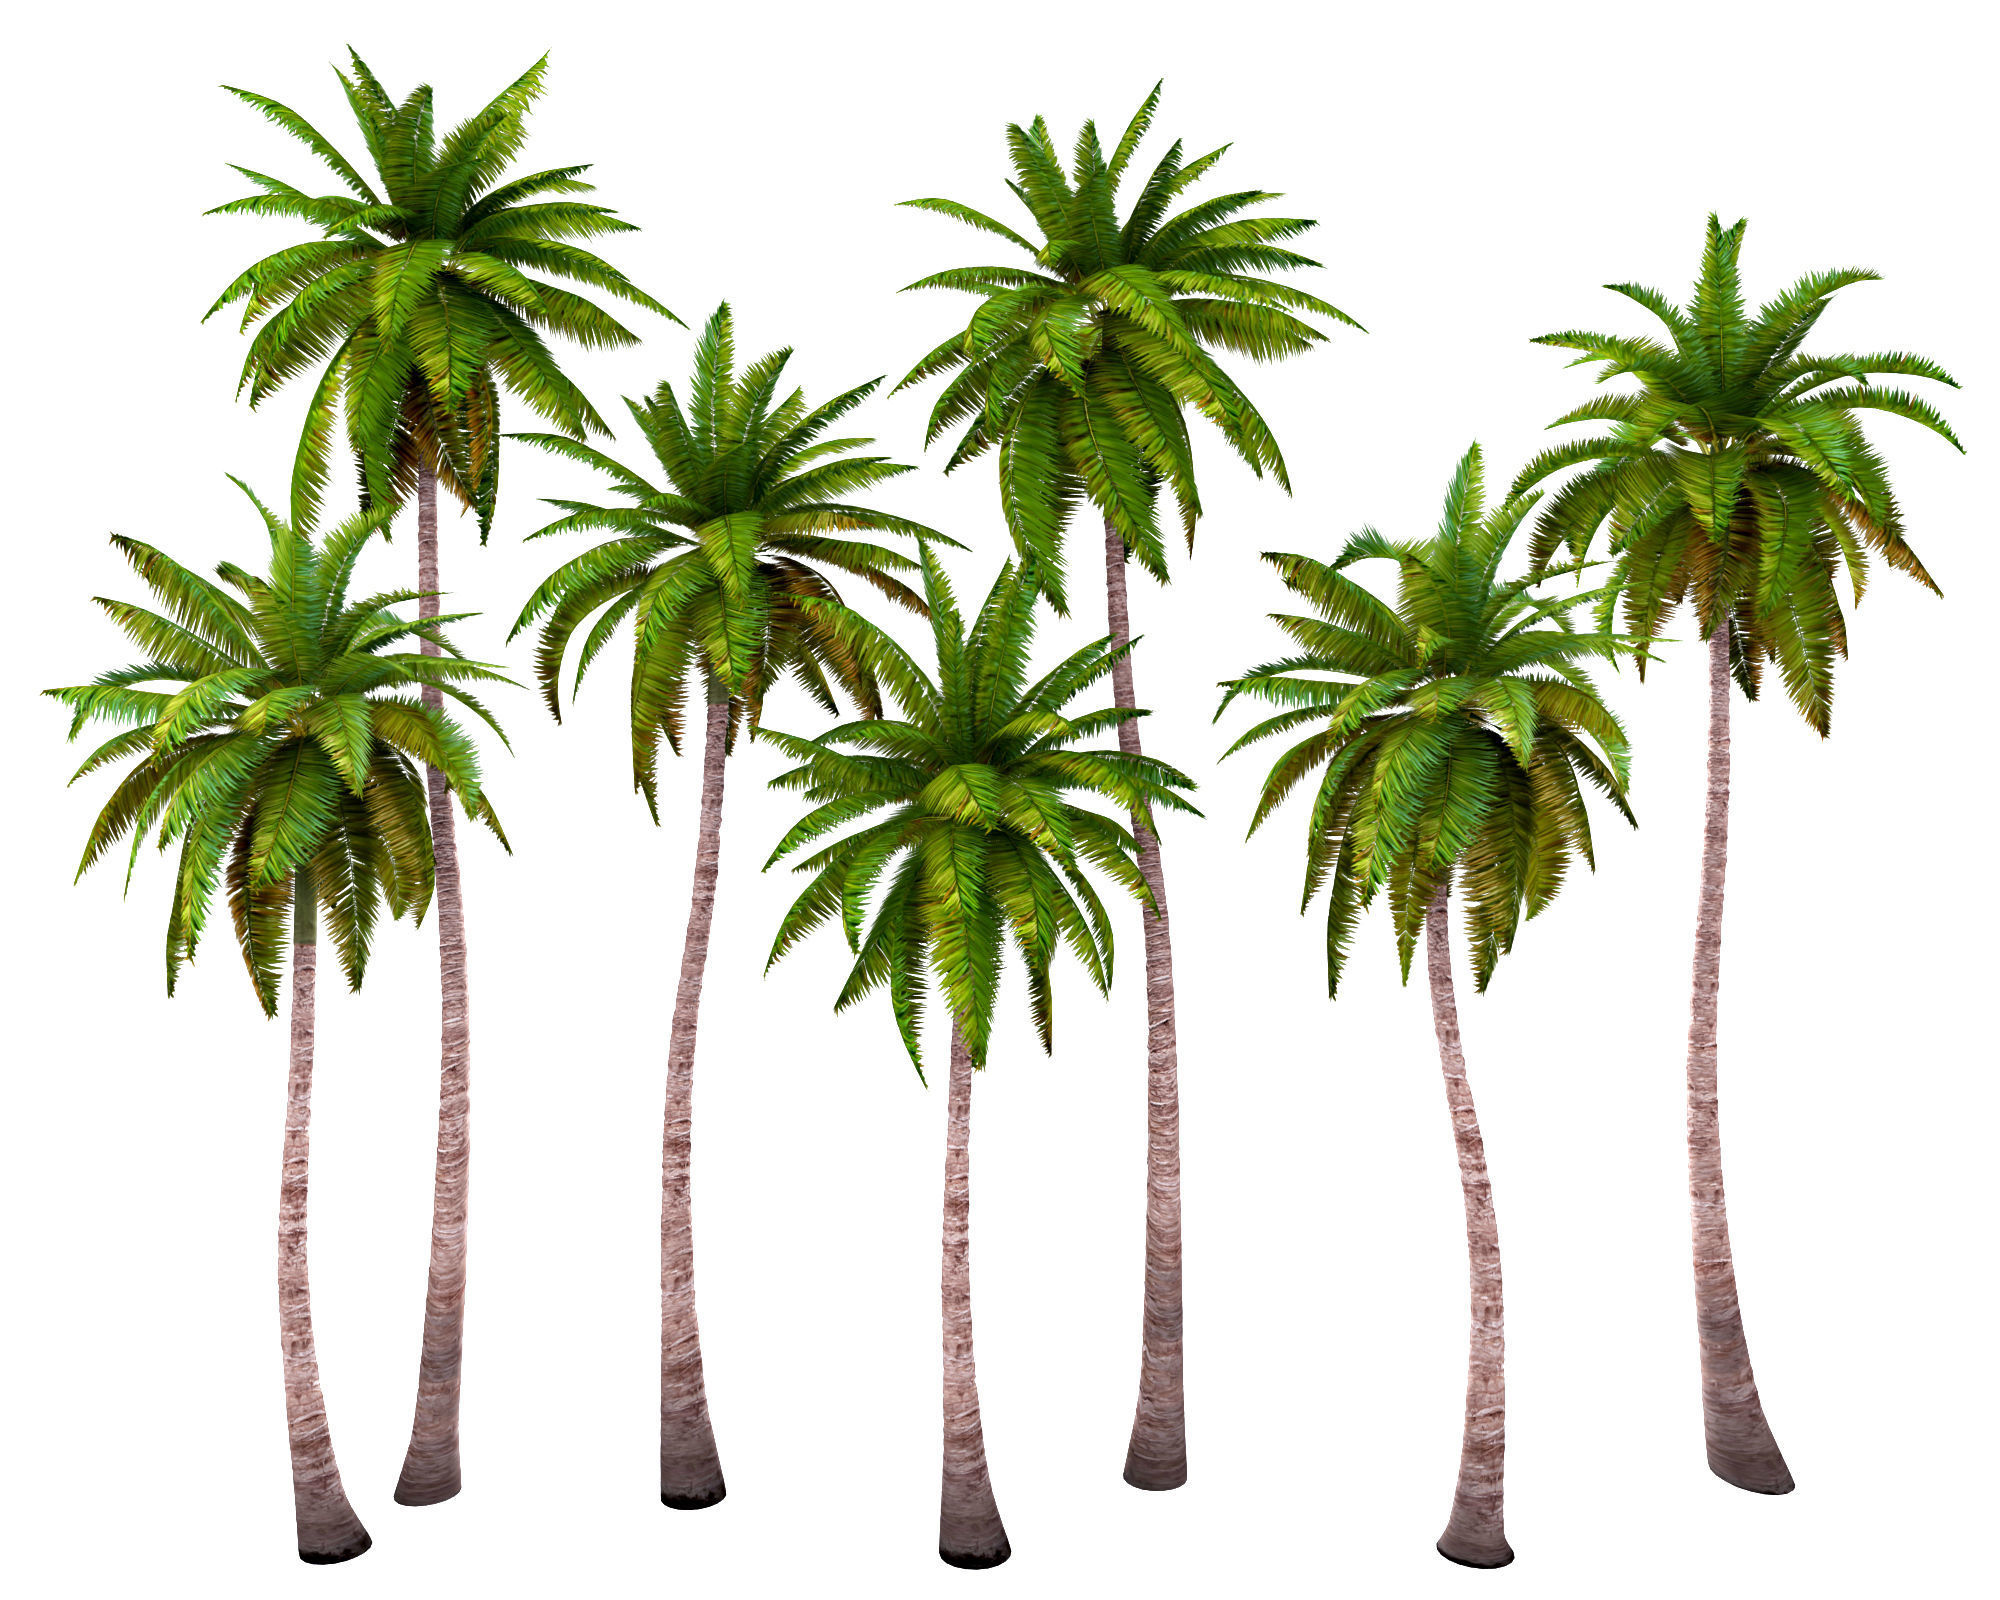 Palms low poly set 1